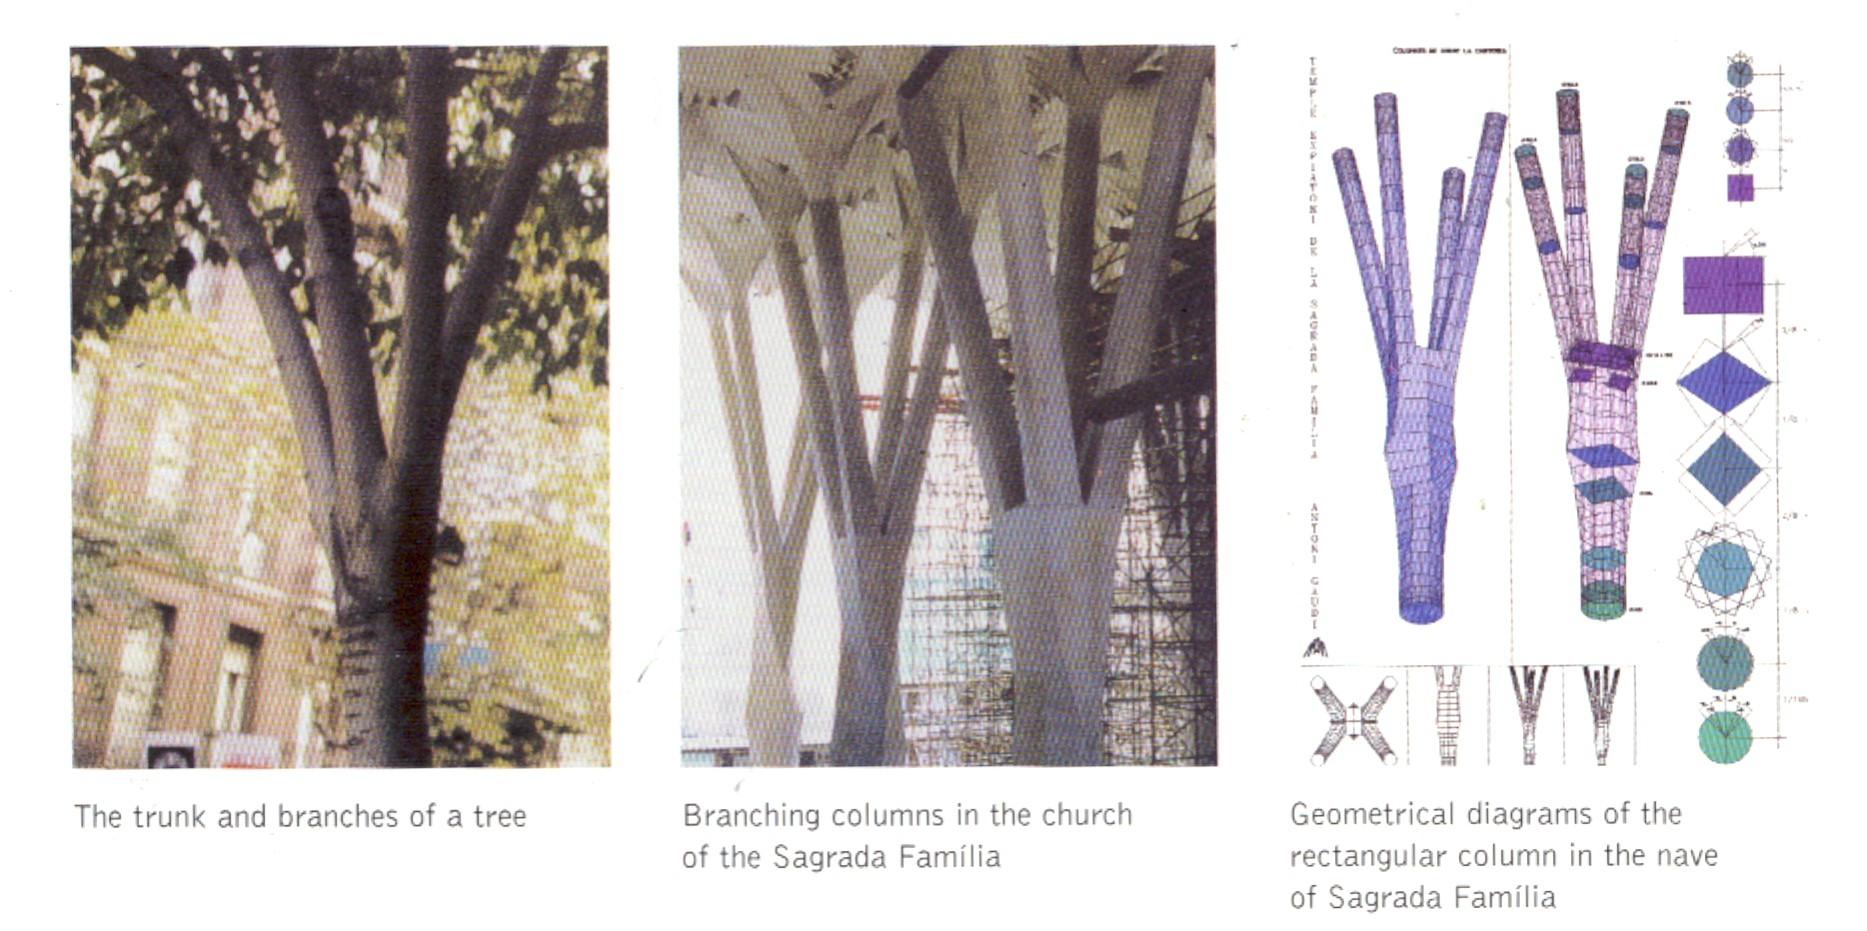 Antonio Gaudi, structural studies for the Sagrada Familia (from Gaudi: Exploring Form, 2002)